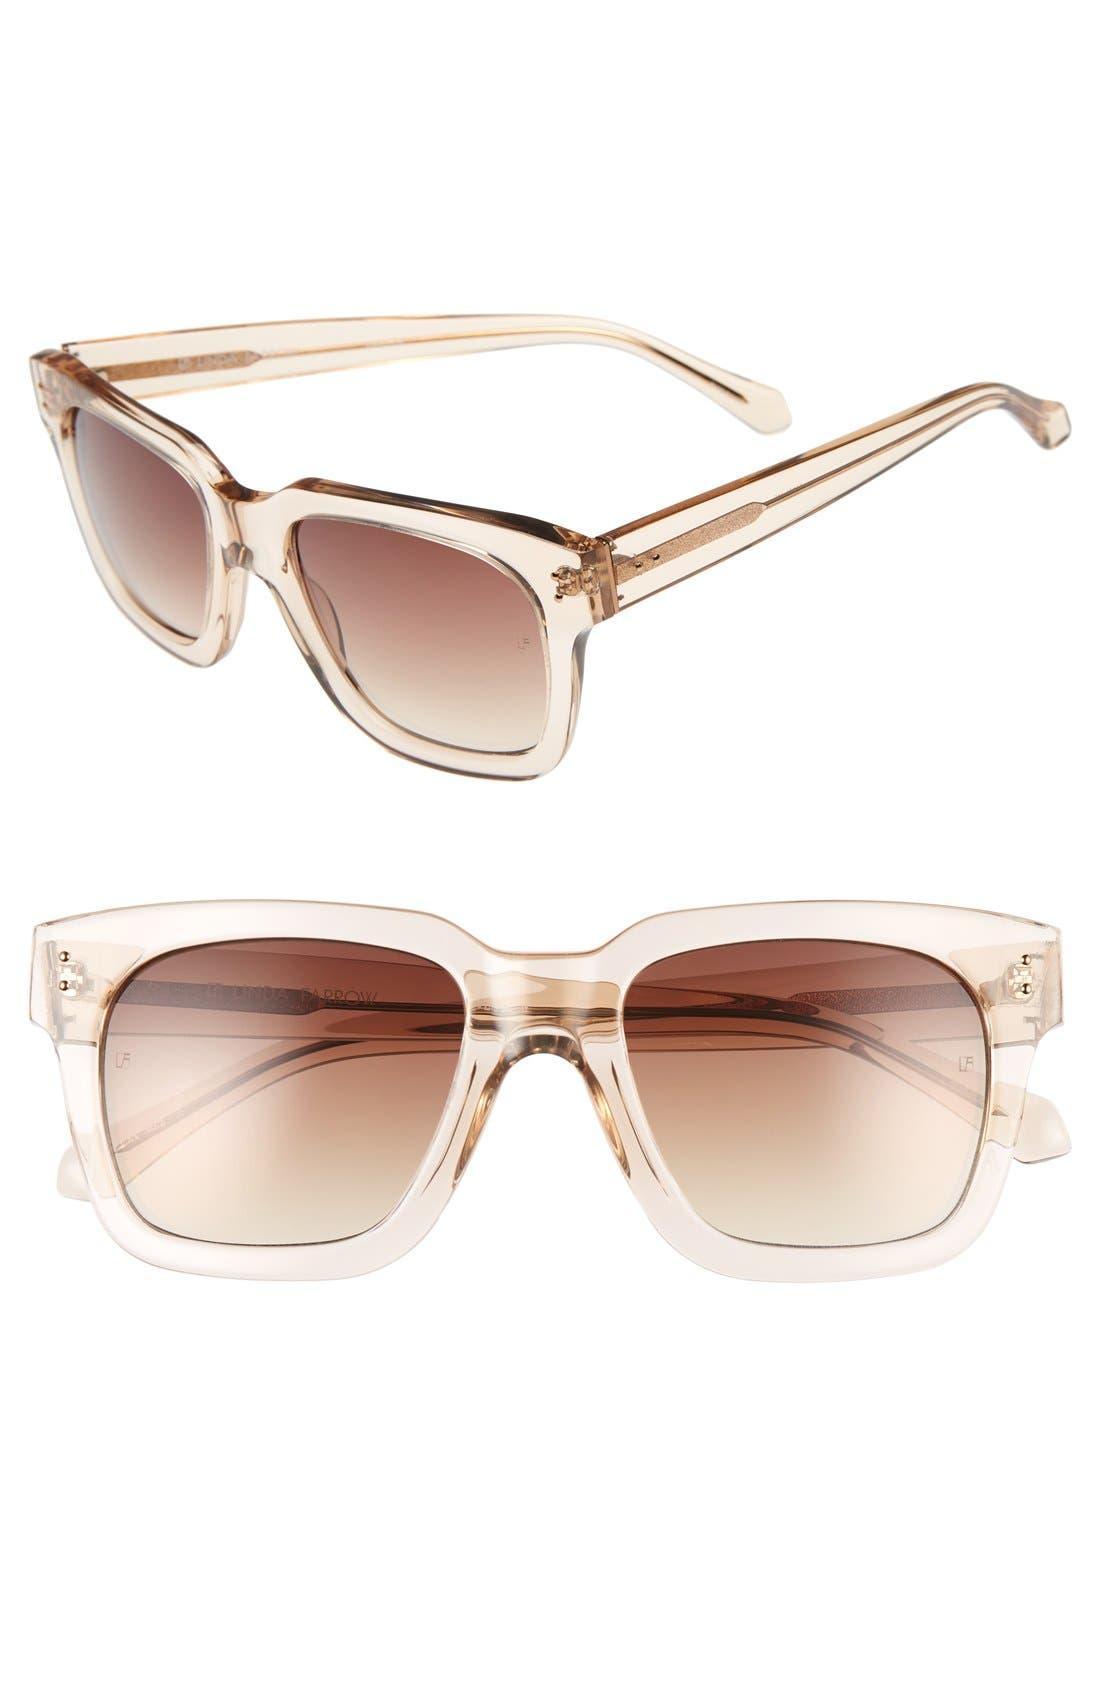 LINDA FARROW 52mm Retro Sunglasses